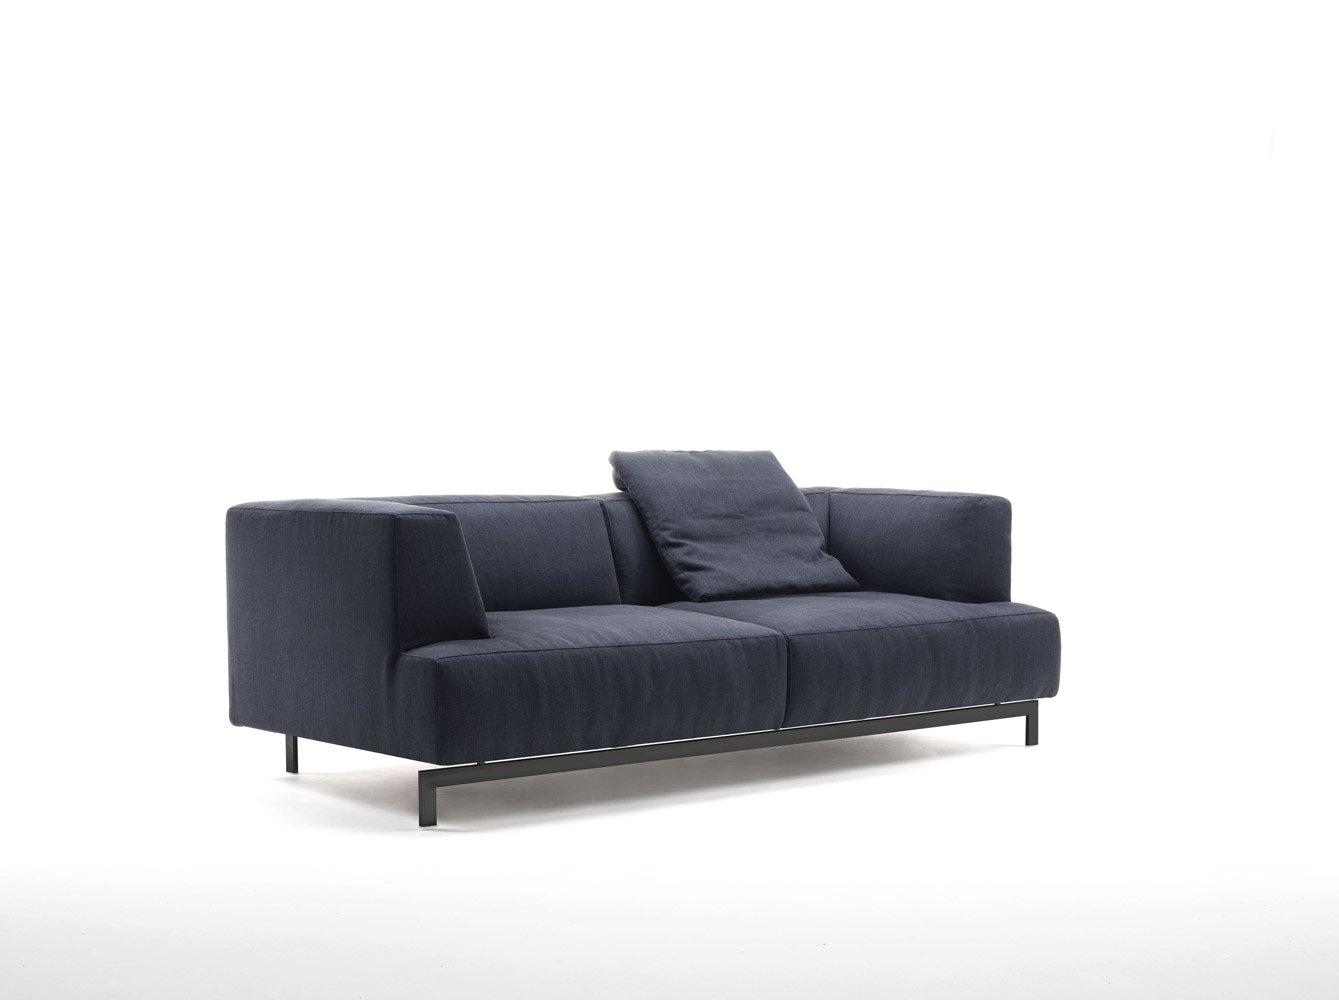 Divani tre posti divano metrocubo da living divani for Divani trento